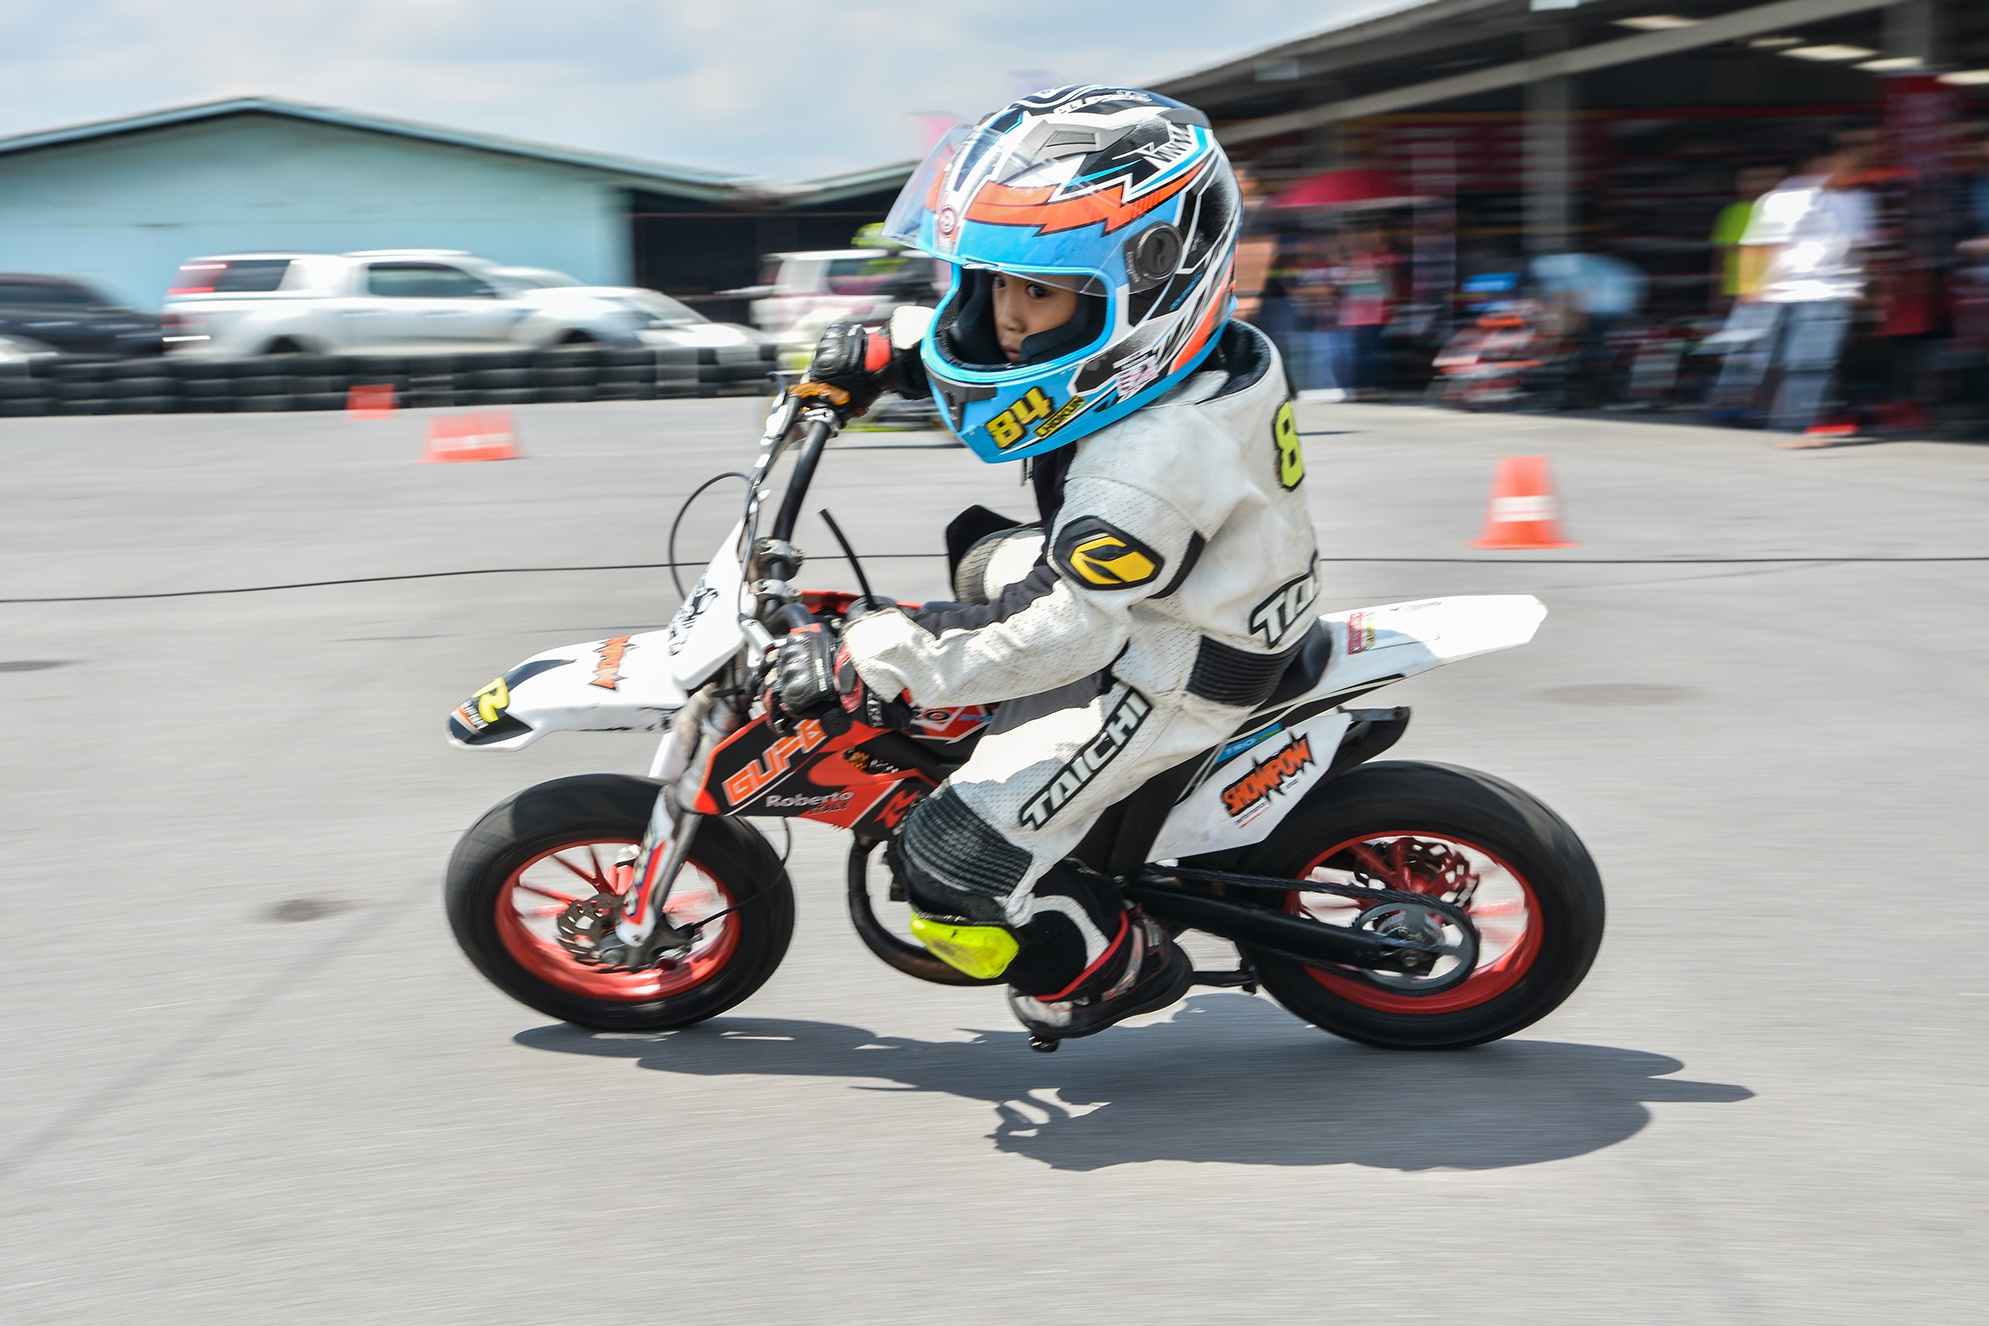 Giai dua moto tre em o Thai Lan va nhung giac mo MotoGP hinh anh 30